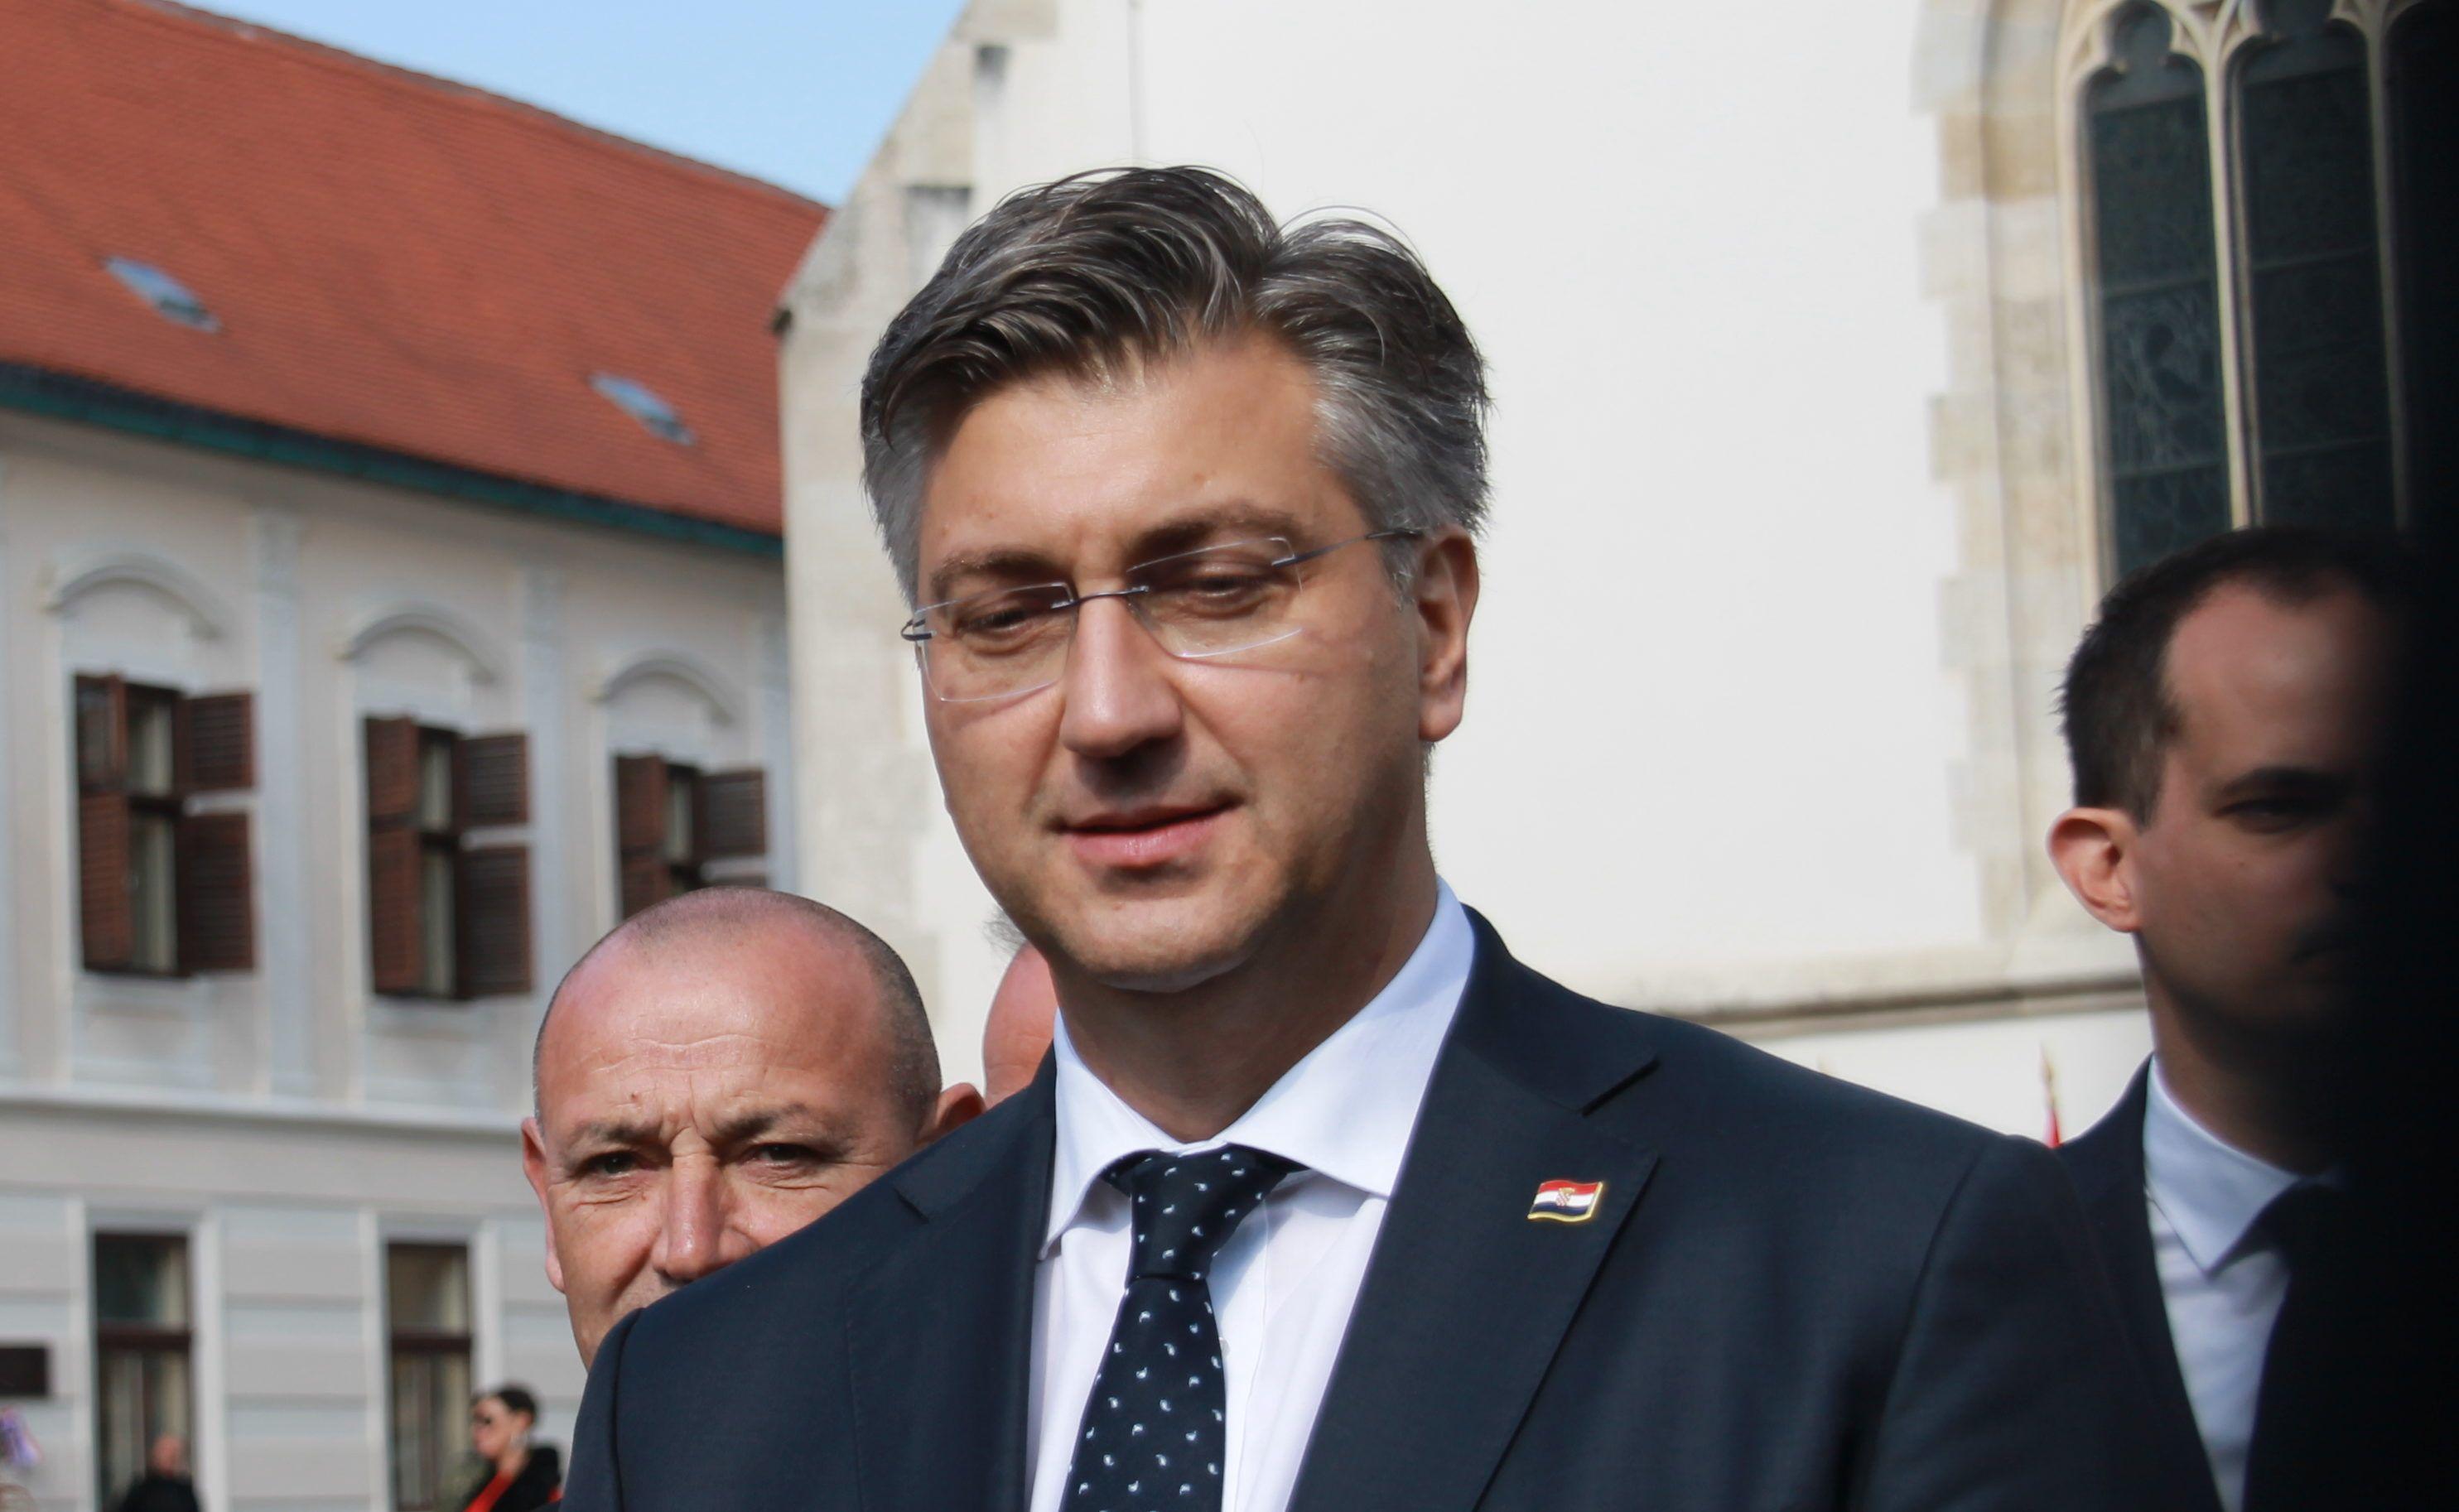 Plenković o jutrošnjem incidentu: U Vukovaru treba voditi politiku smirivanja tenzija